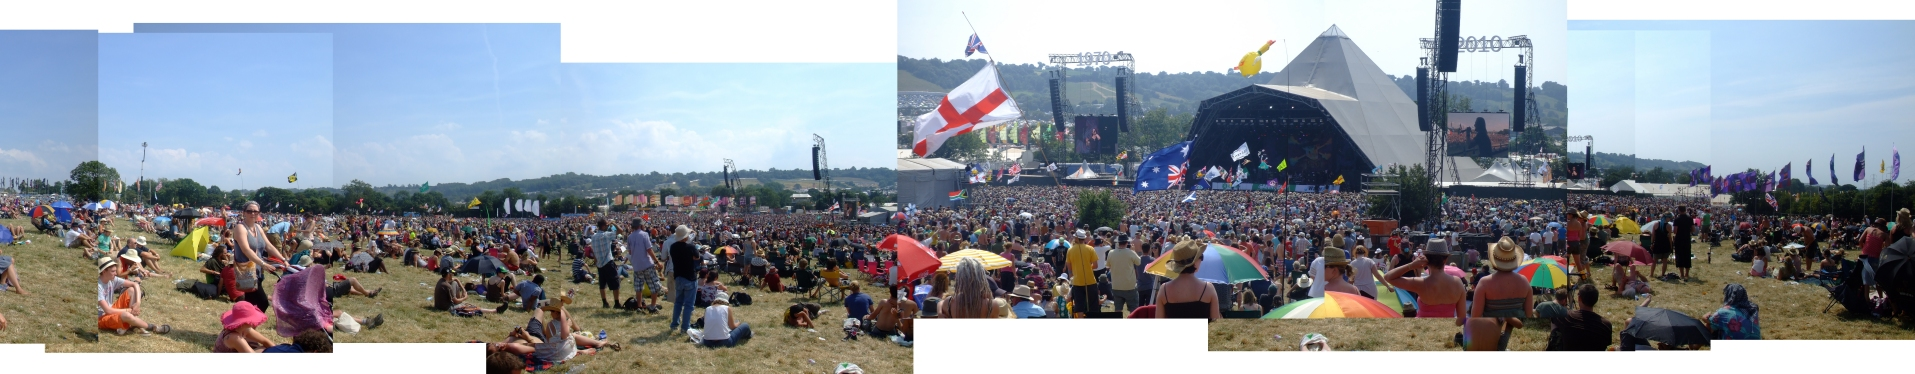 Glastonbury Festival montage